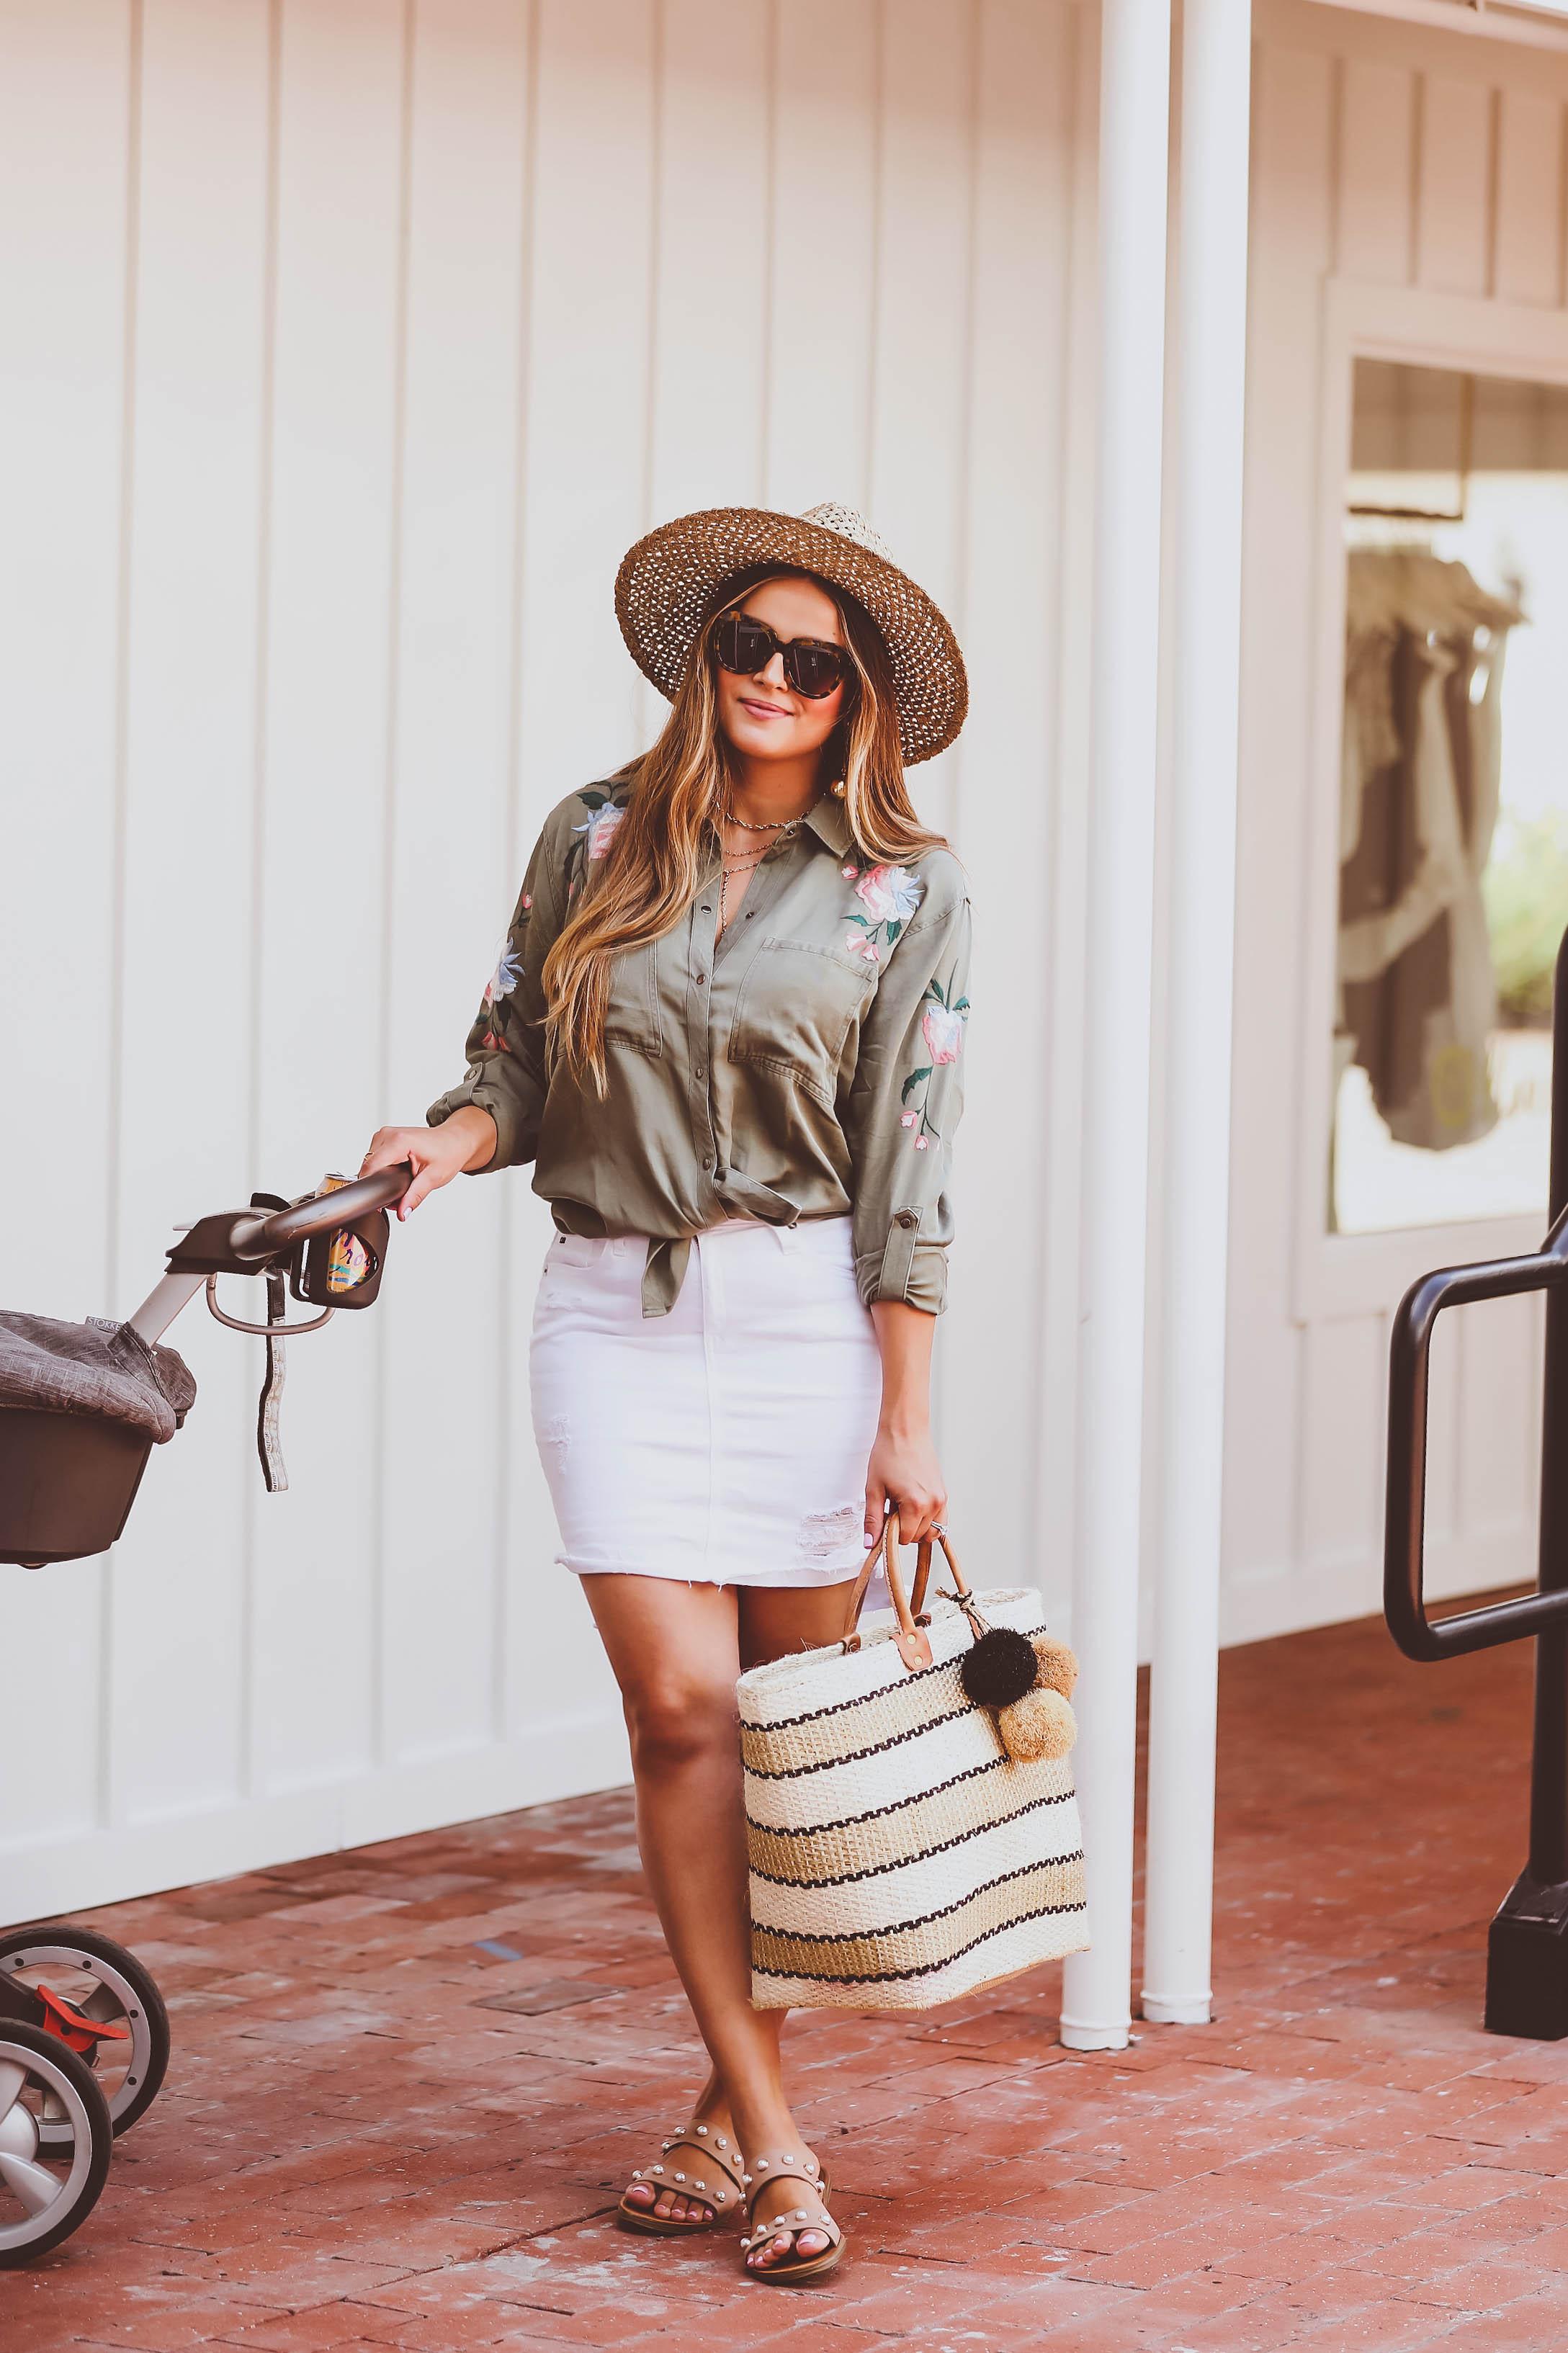 #OOTD // Green Embroidered Button-Down Shirt & White Denim Skirt | BondGirlGlam.com